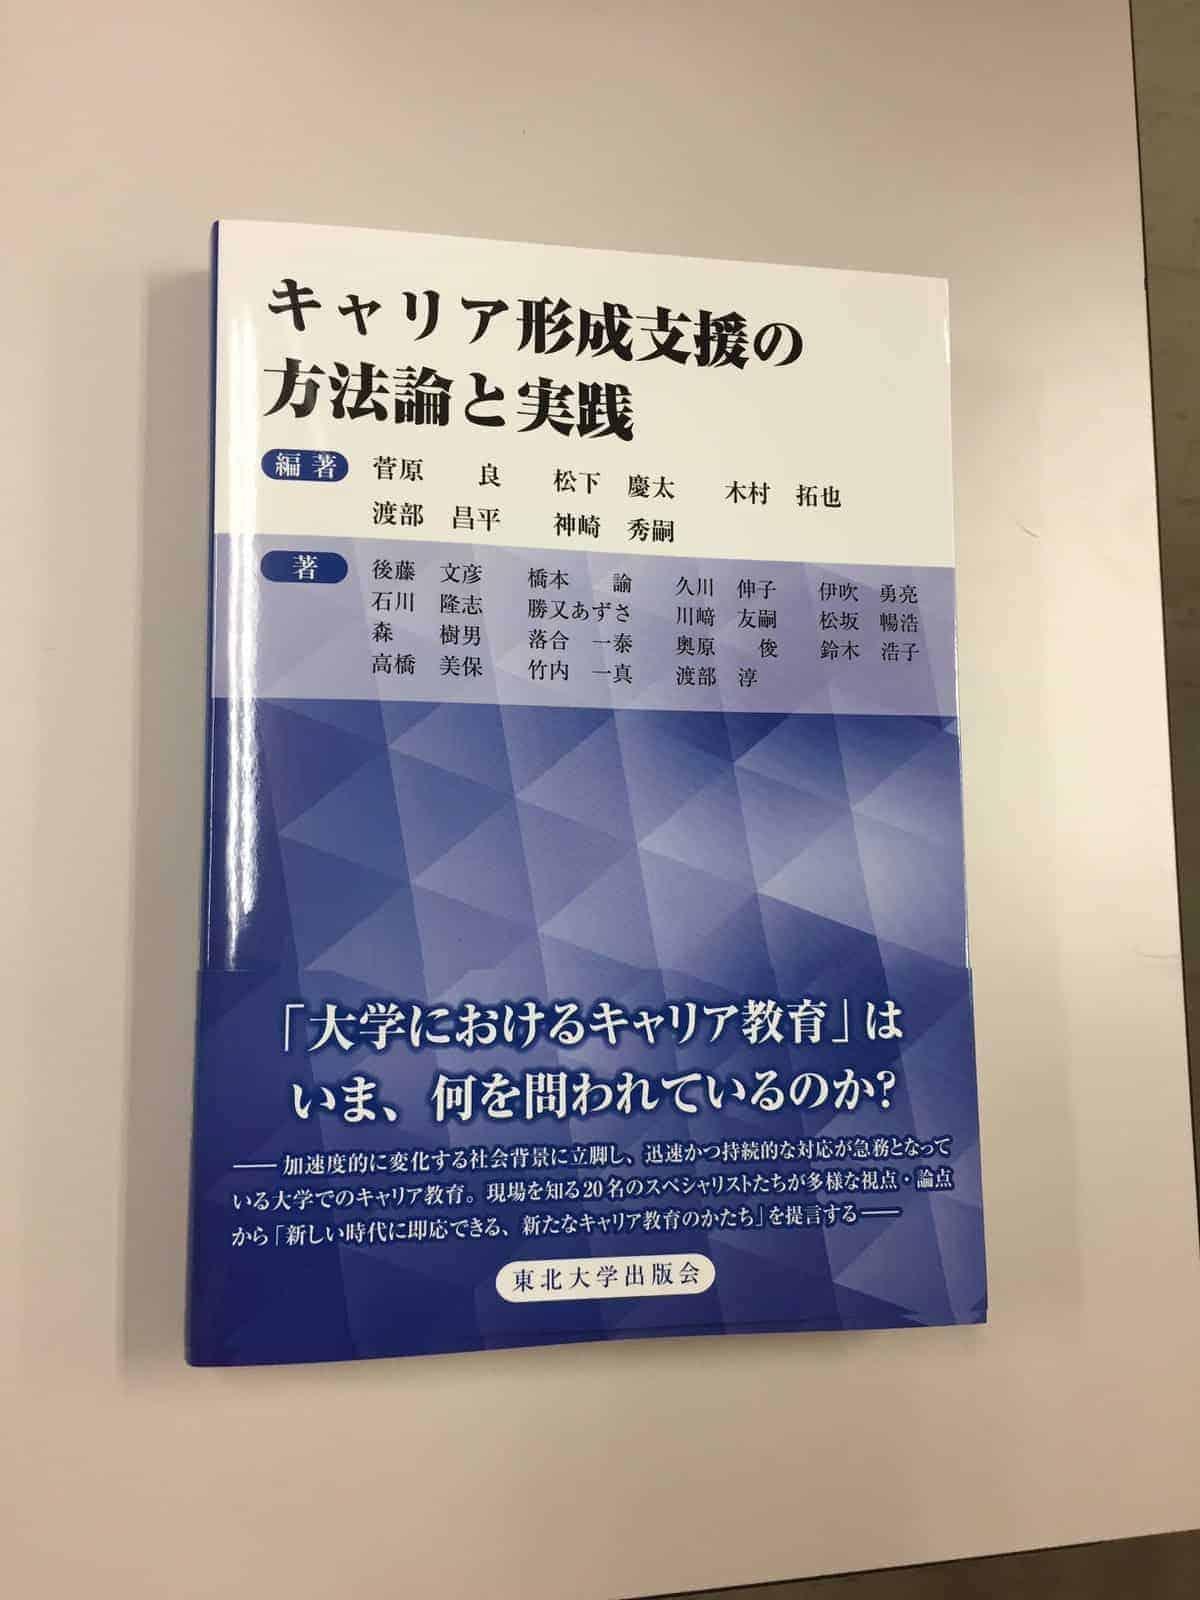 IMG 7688 - 【SDGs目標3】感染症の問題は日本では関係ない?